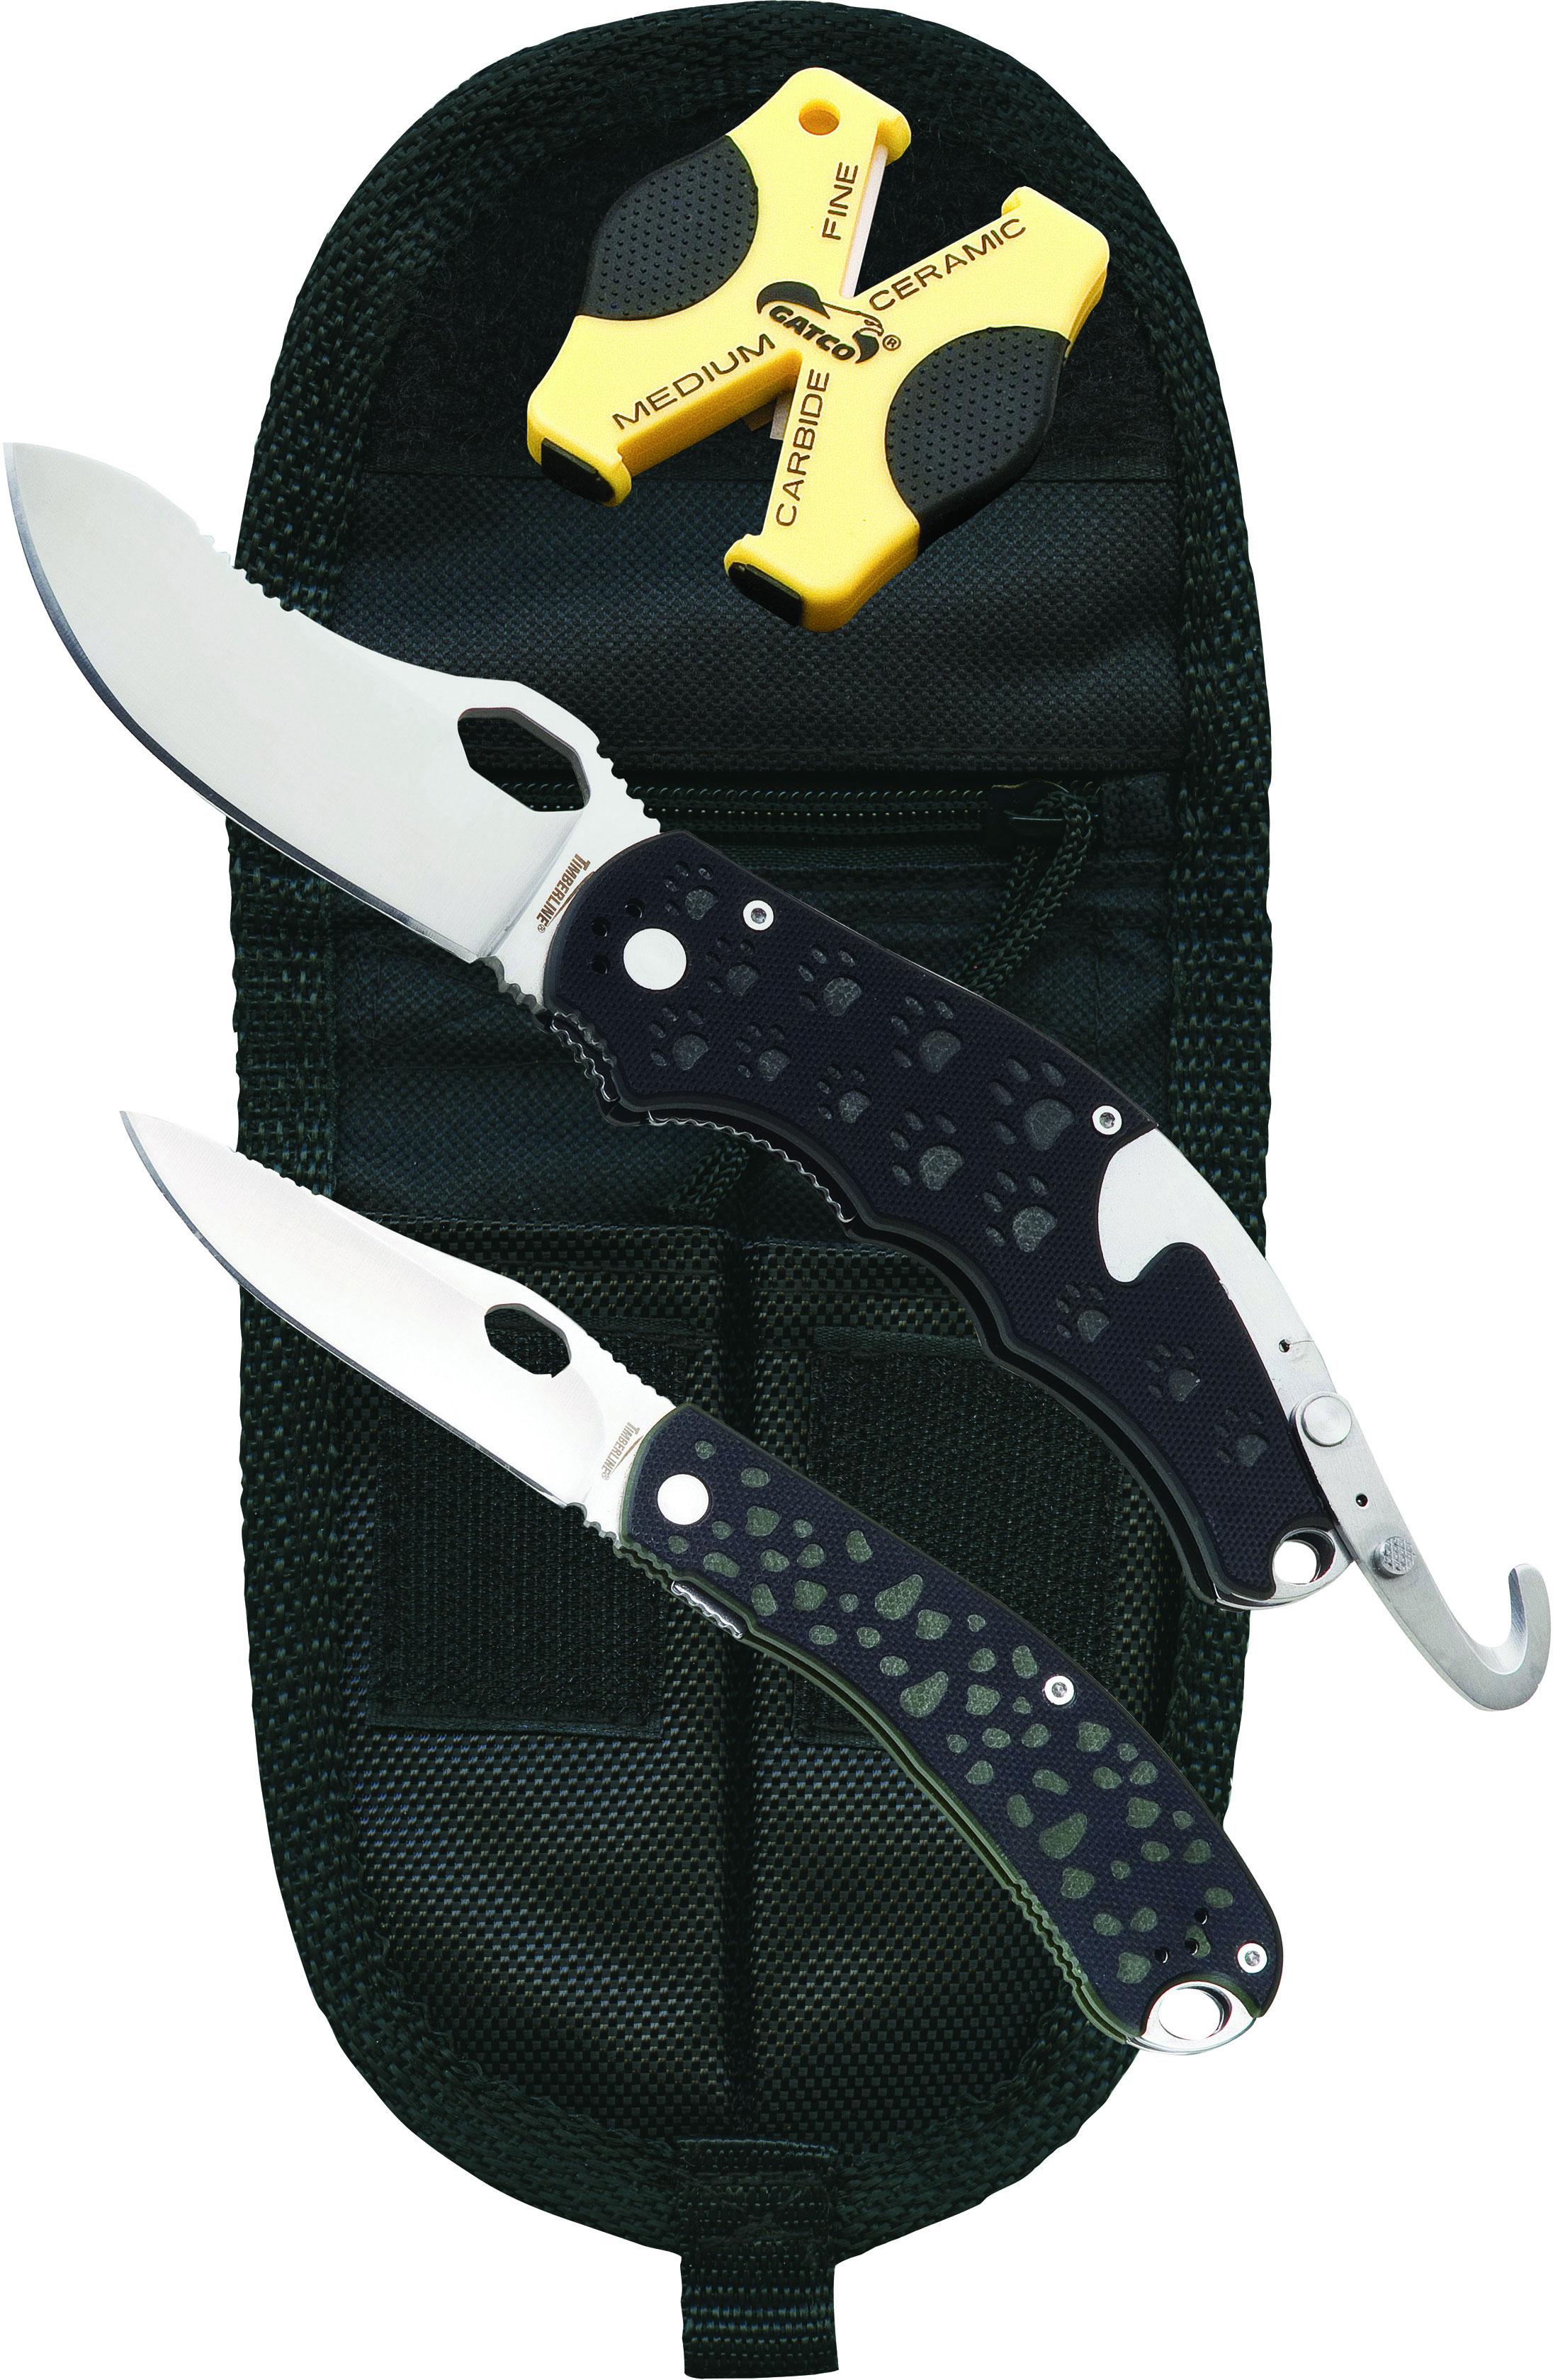 Timberline Tim Wegner  inchSimba inch &  inchChui inch Folding Hunter Set, D2 Tool Steel Blades, Nylon Sheath